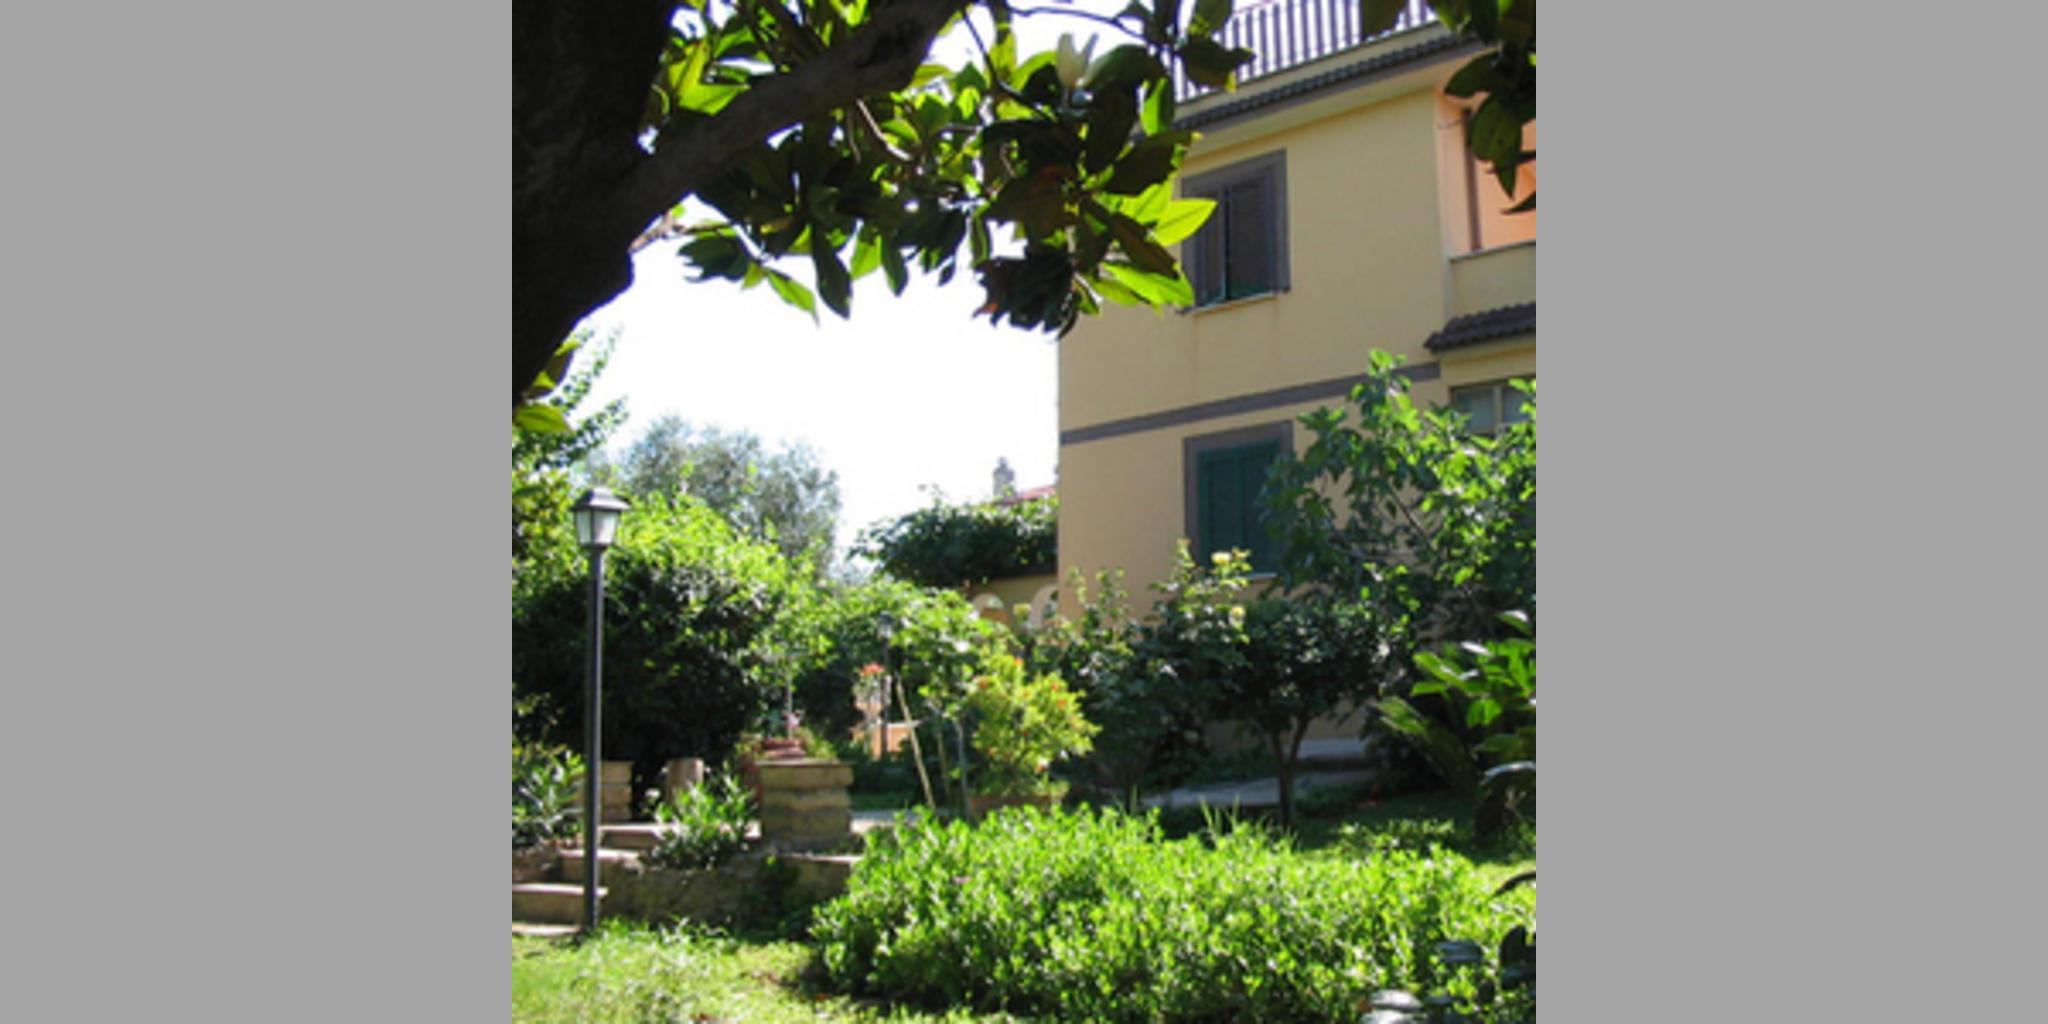 Bed & Breakfast Zagarolo - Valle Martella